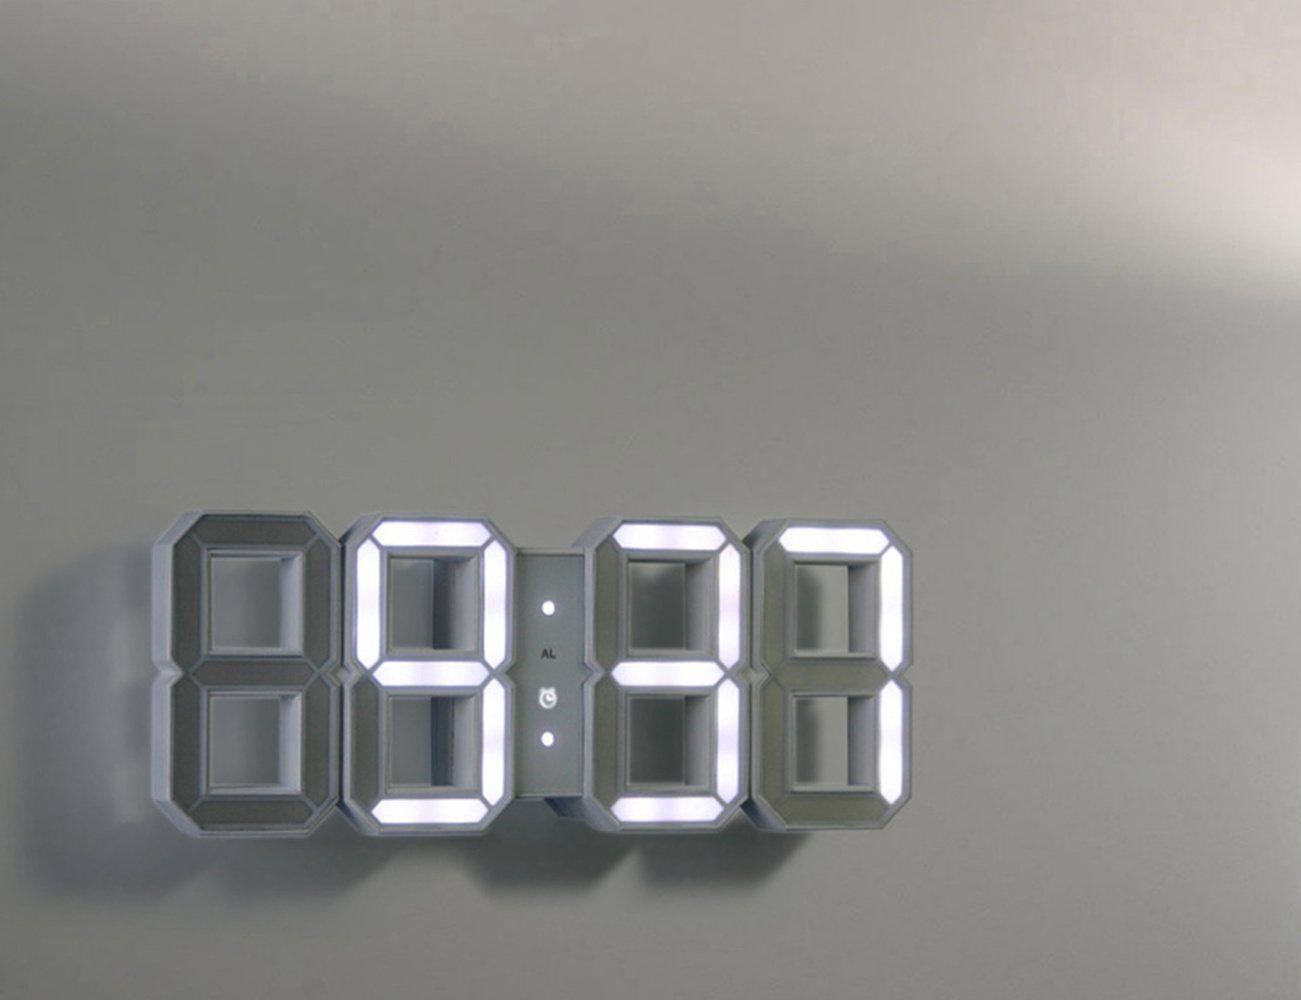 White & White Clock 3D Digital LED Black Edition Clock